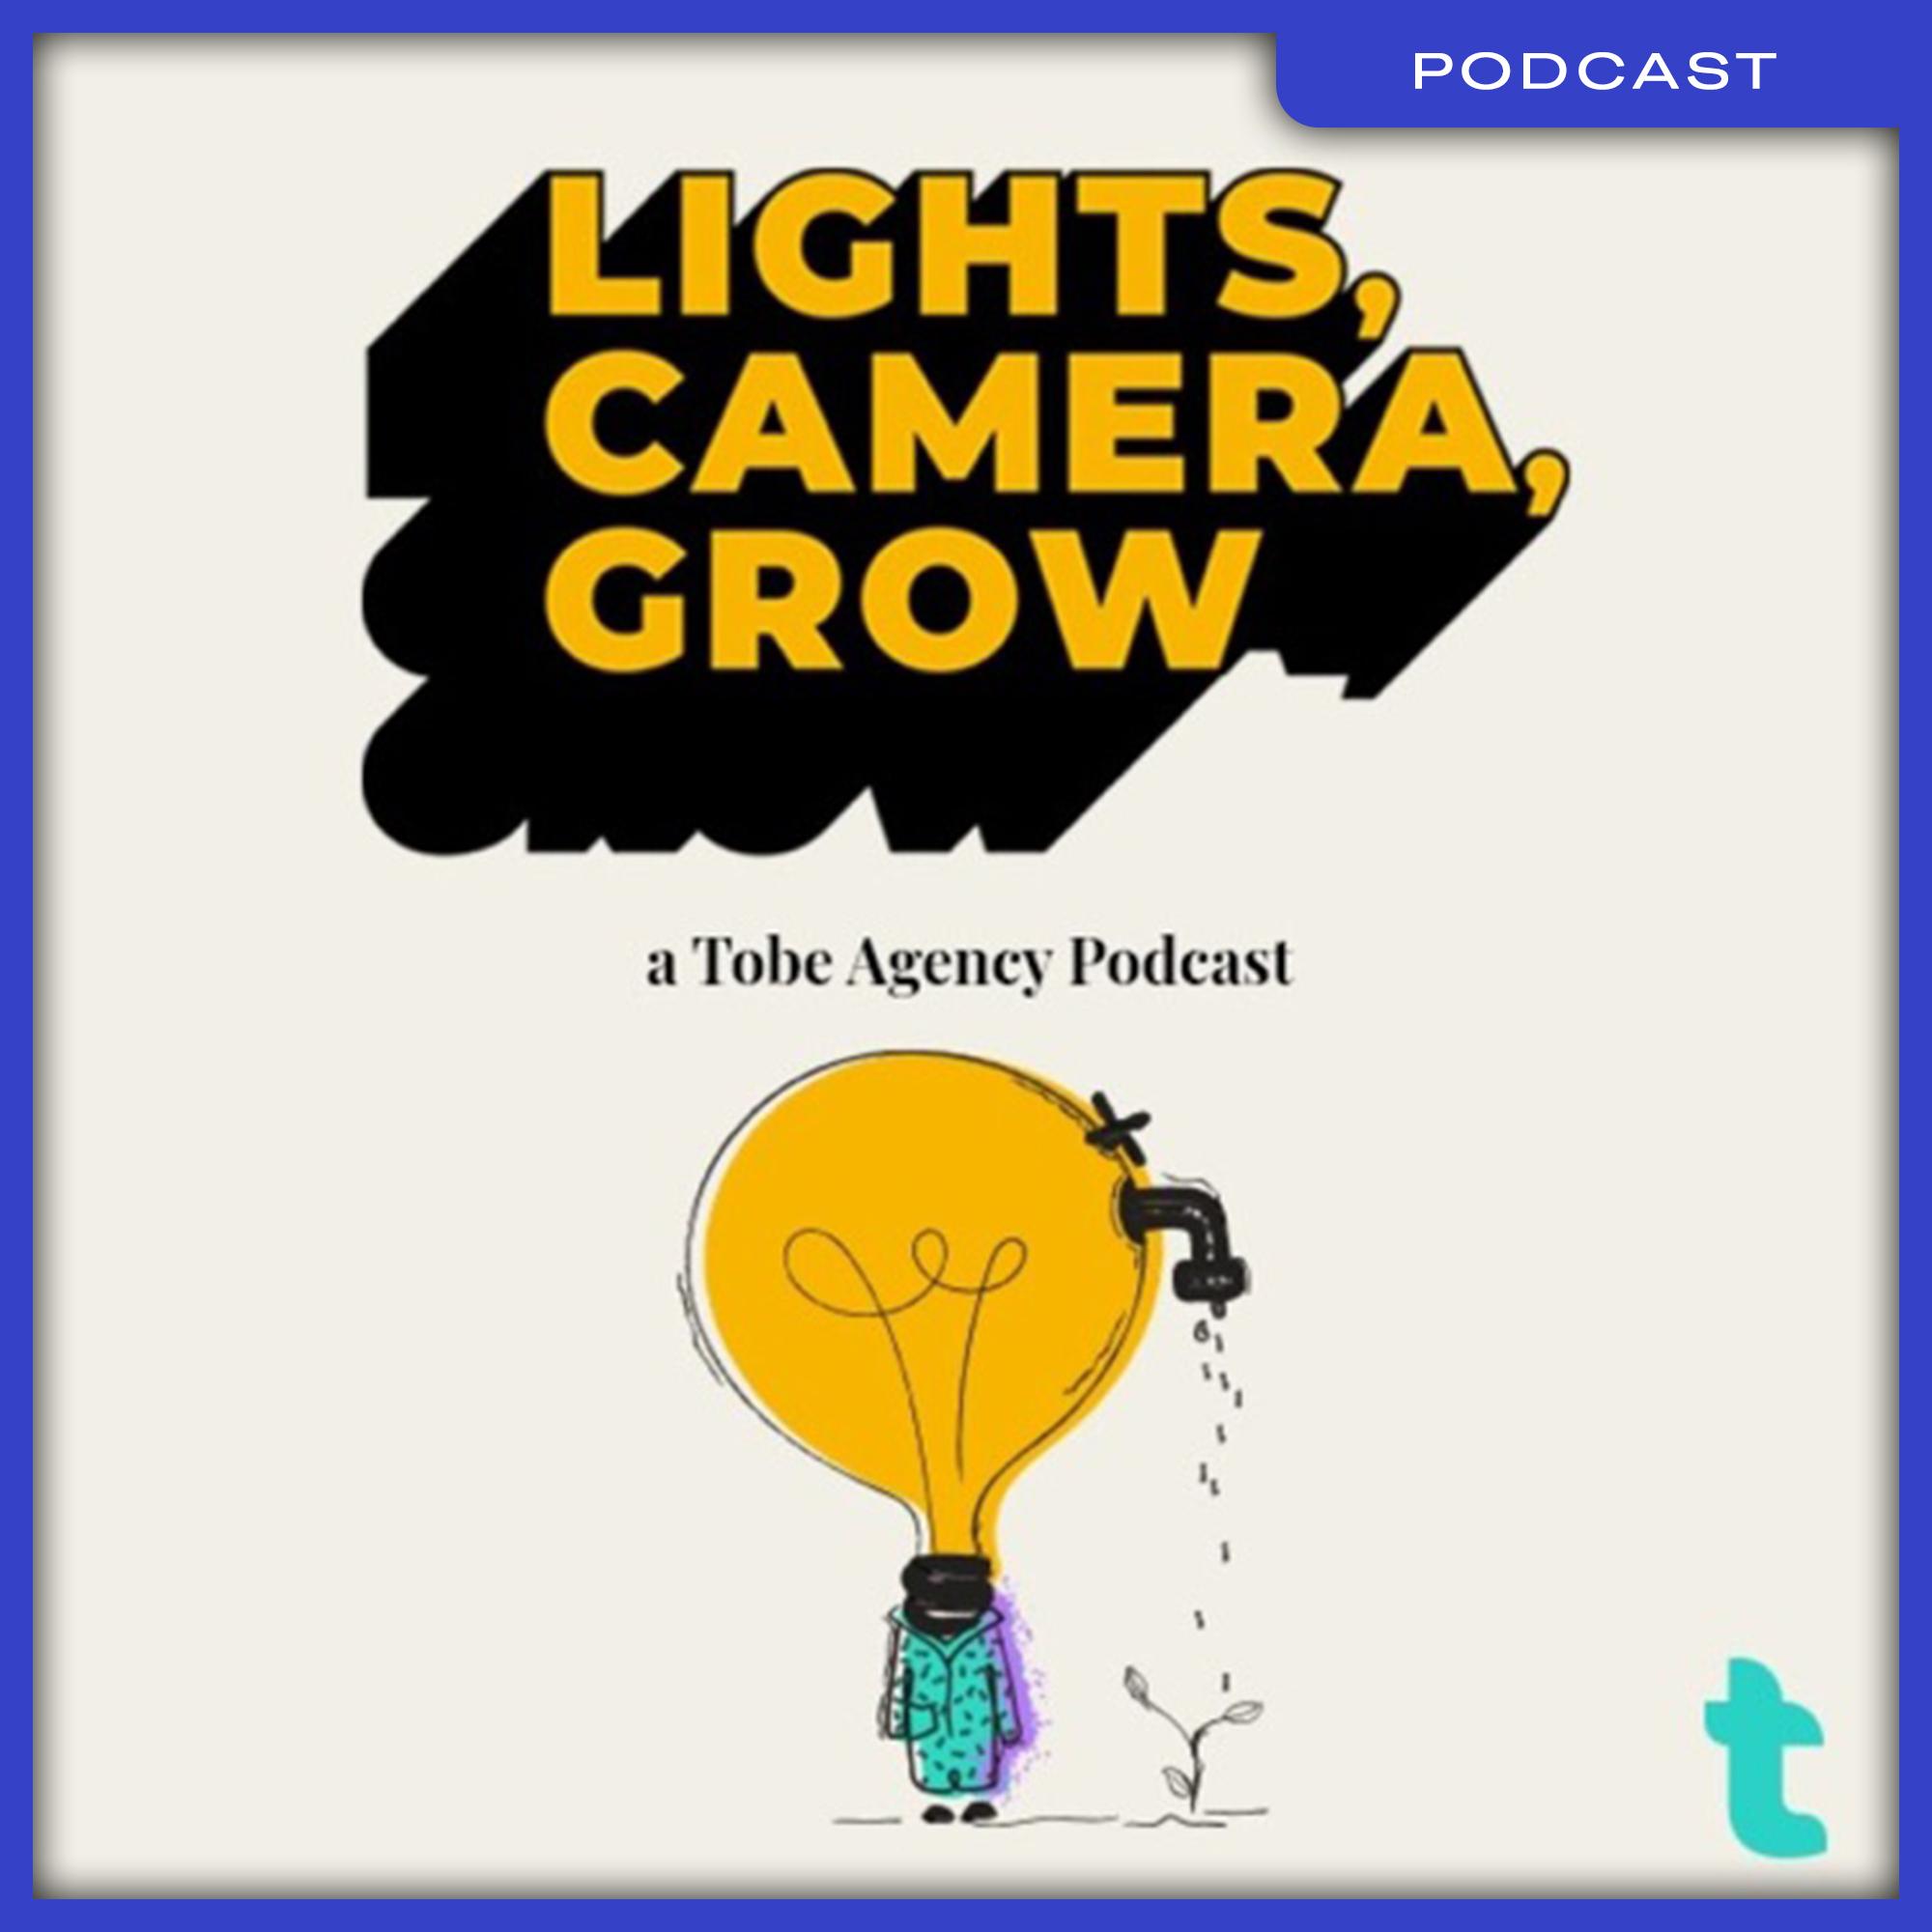 04_Podcast_LightsCameraGrow